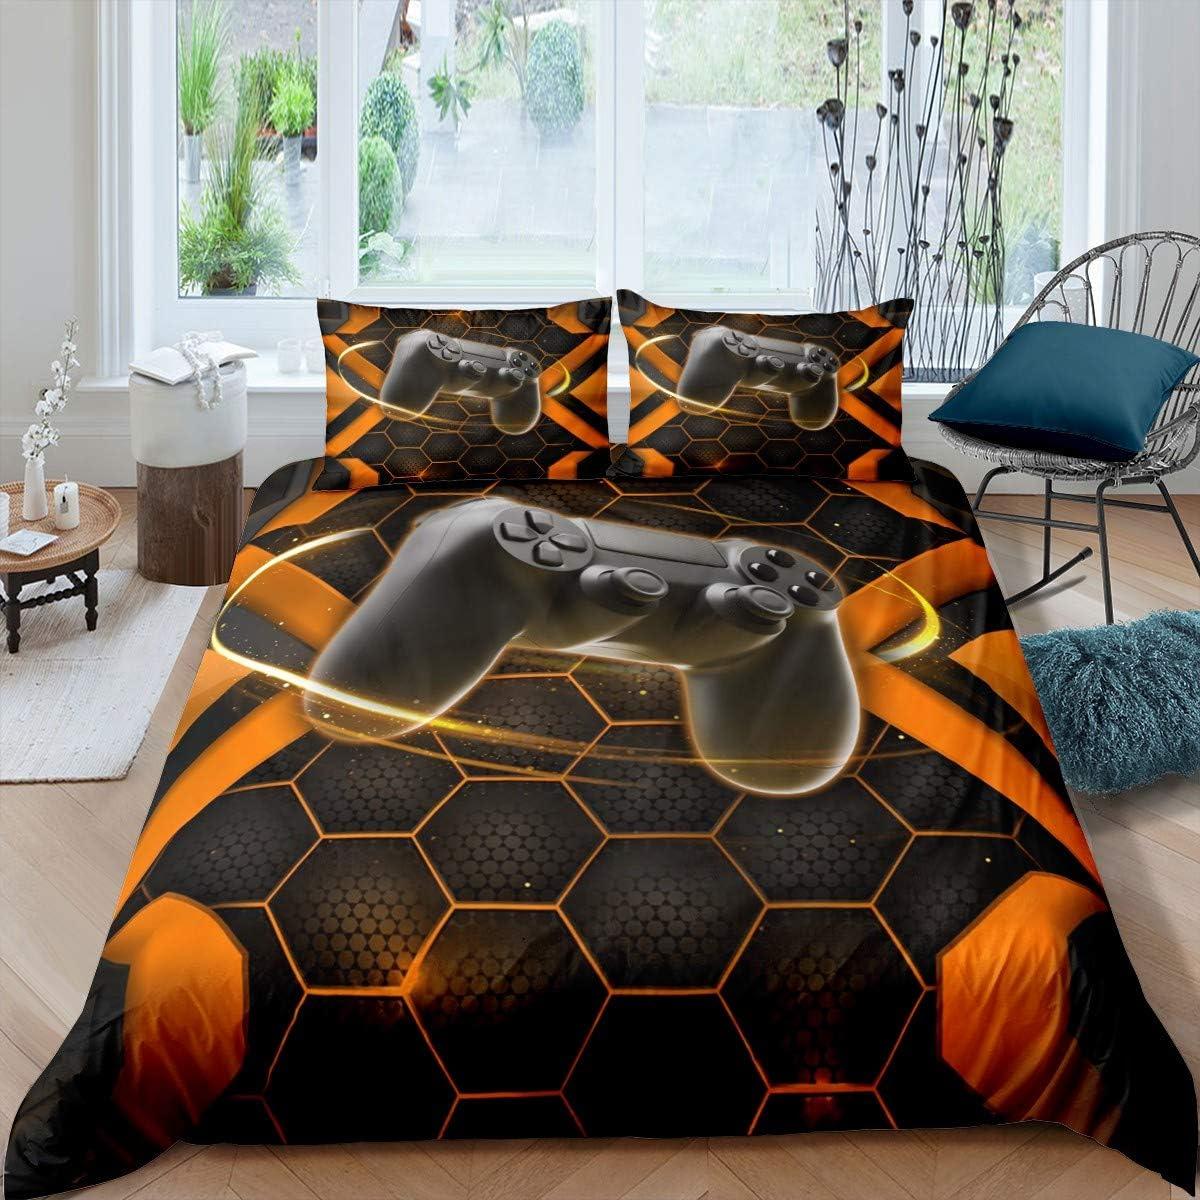 Regular dealer Gaming Bedding Set Twin Max 50% OFF Size for Games Kids Teens Video Boys Com